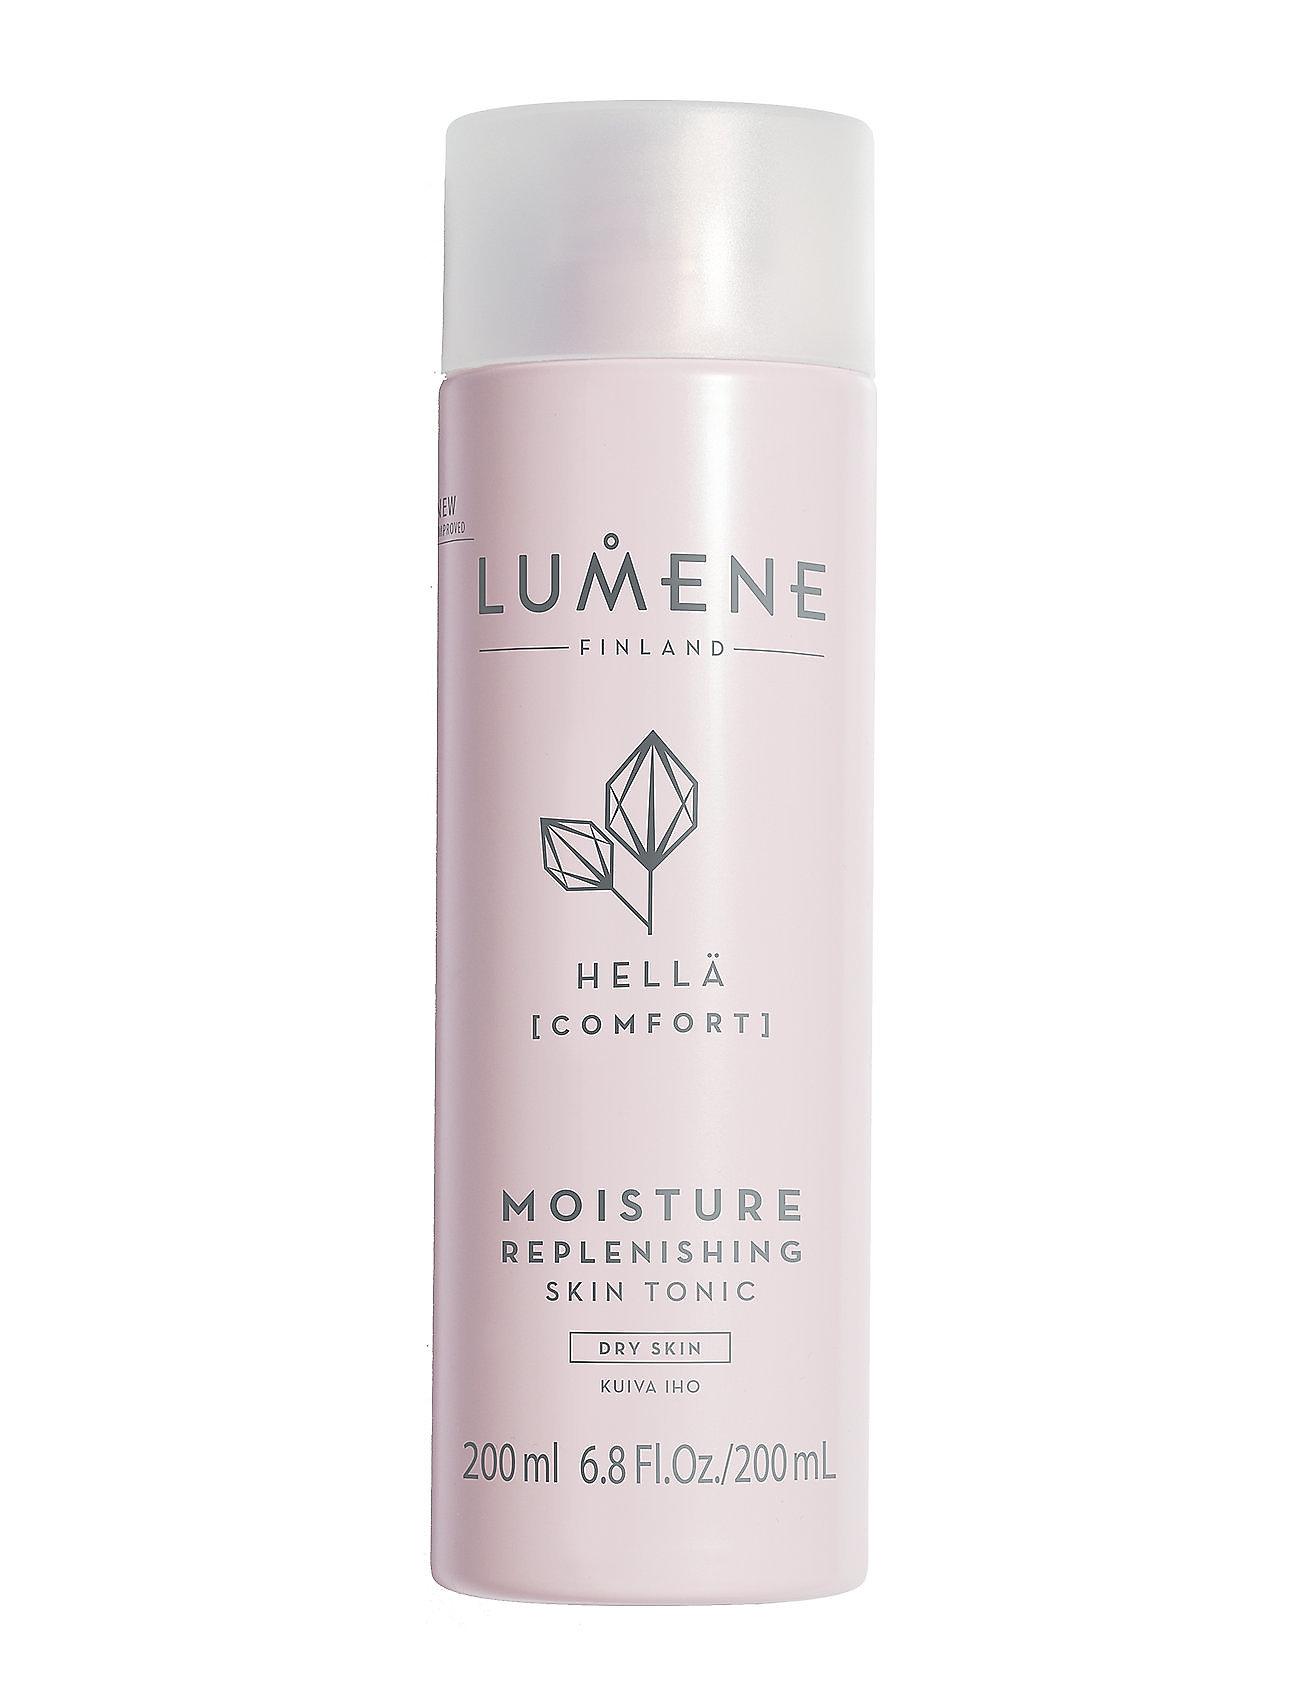 Image of HellÄ Moisturizing T R Beauty WOMEN Skin Care Face T Rs Nude LUMENE (3297437425)